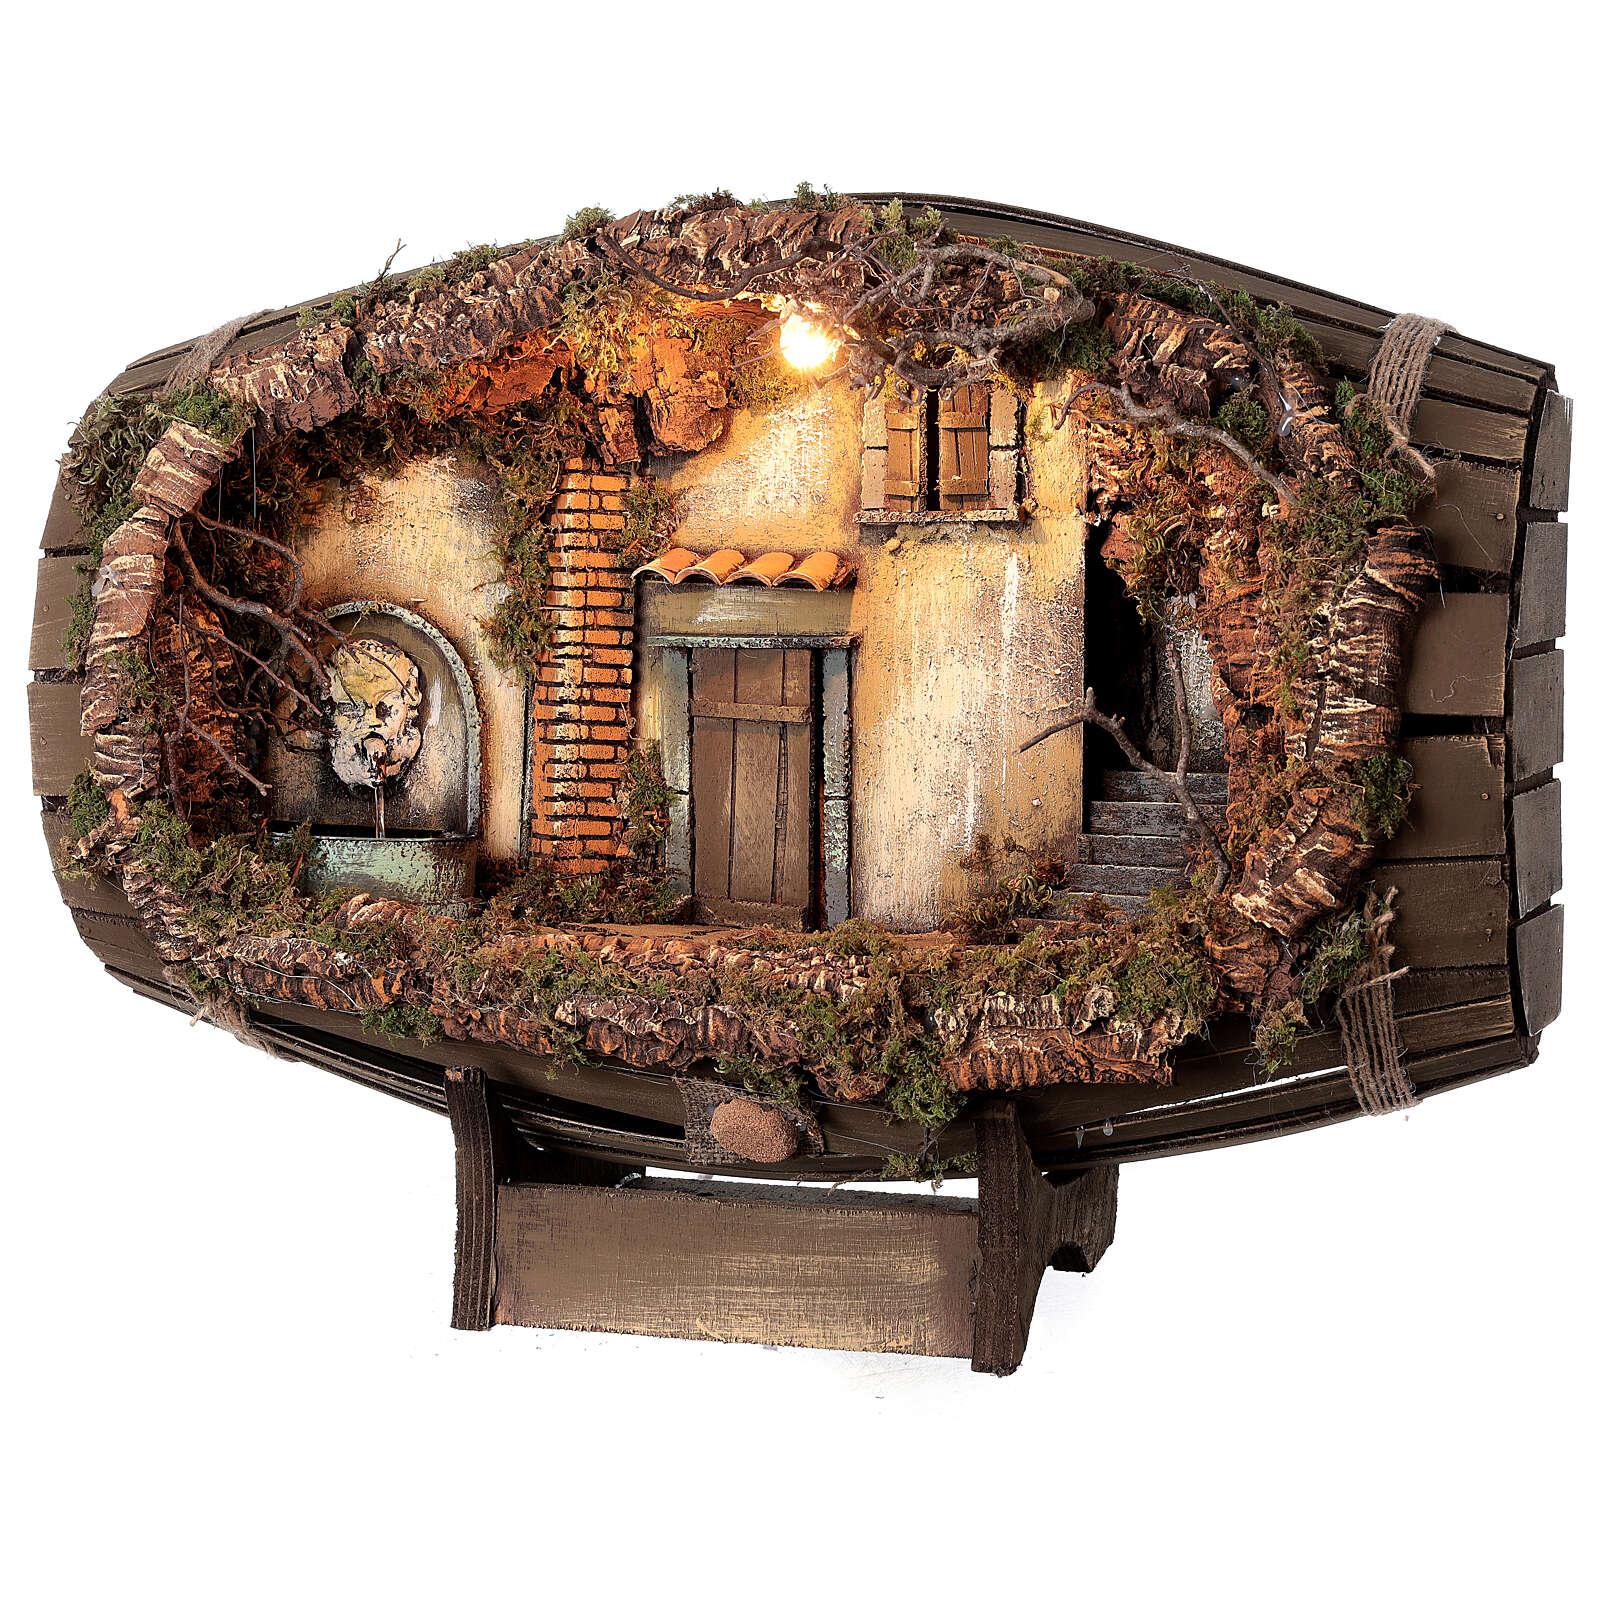 Barrel electric fountain for Neapolitan Nativity Scene with 10 cm figurines 4